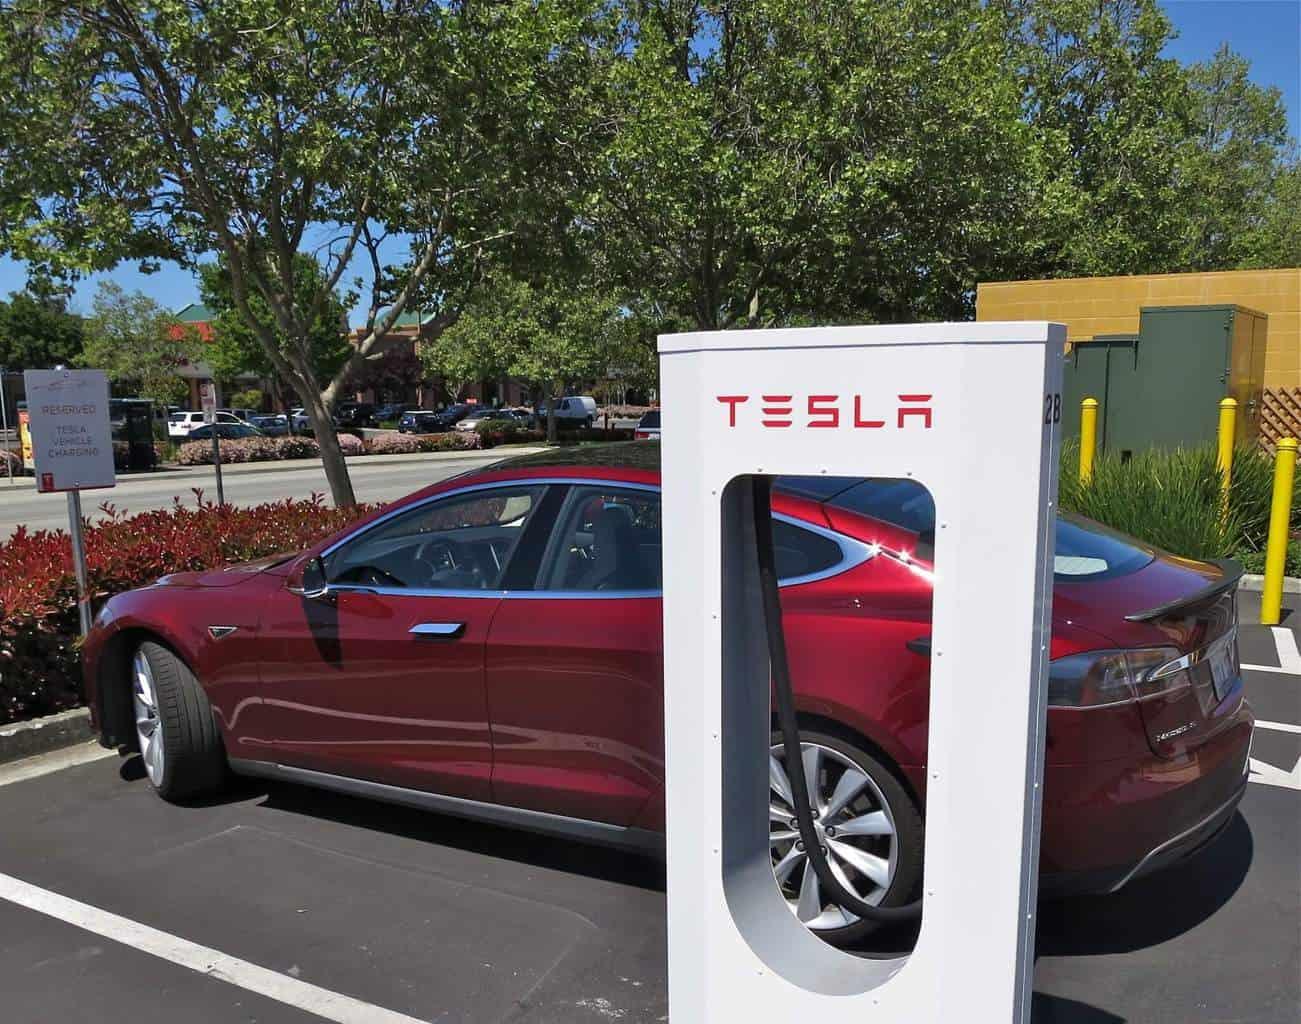 Tesla Motors Inc (TSLA) Drives Battery Costs Lower Than Most